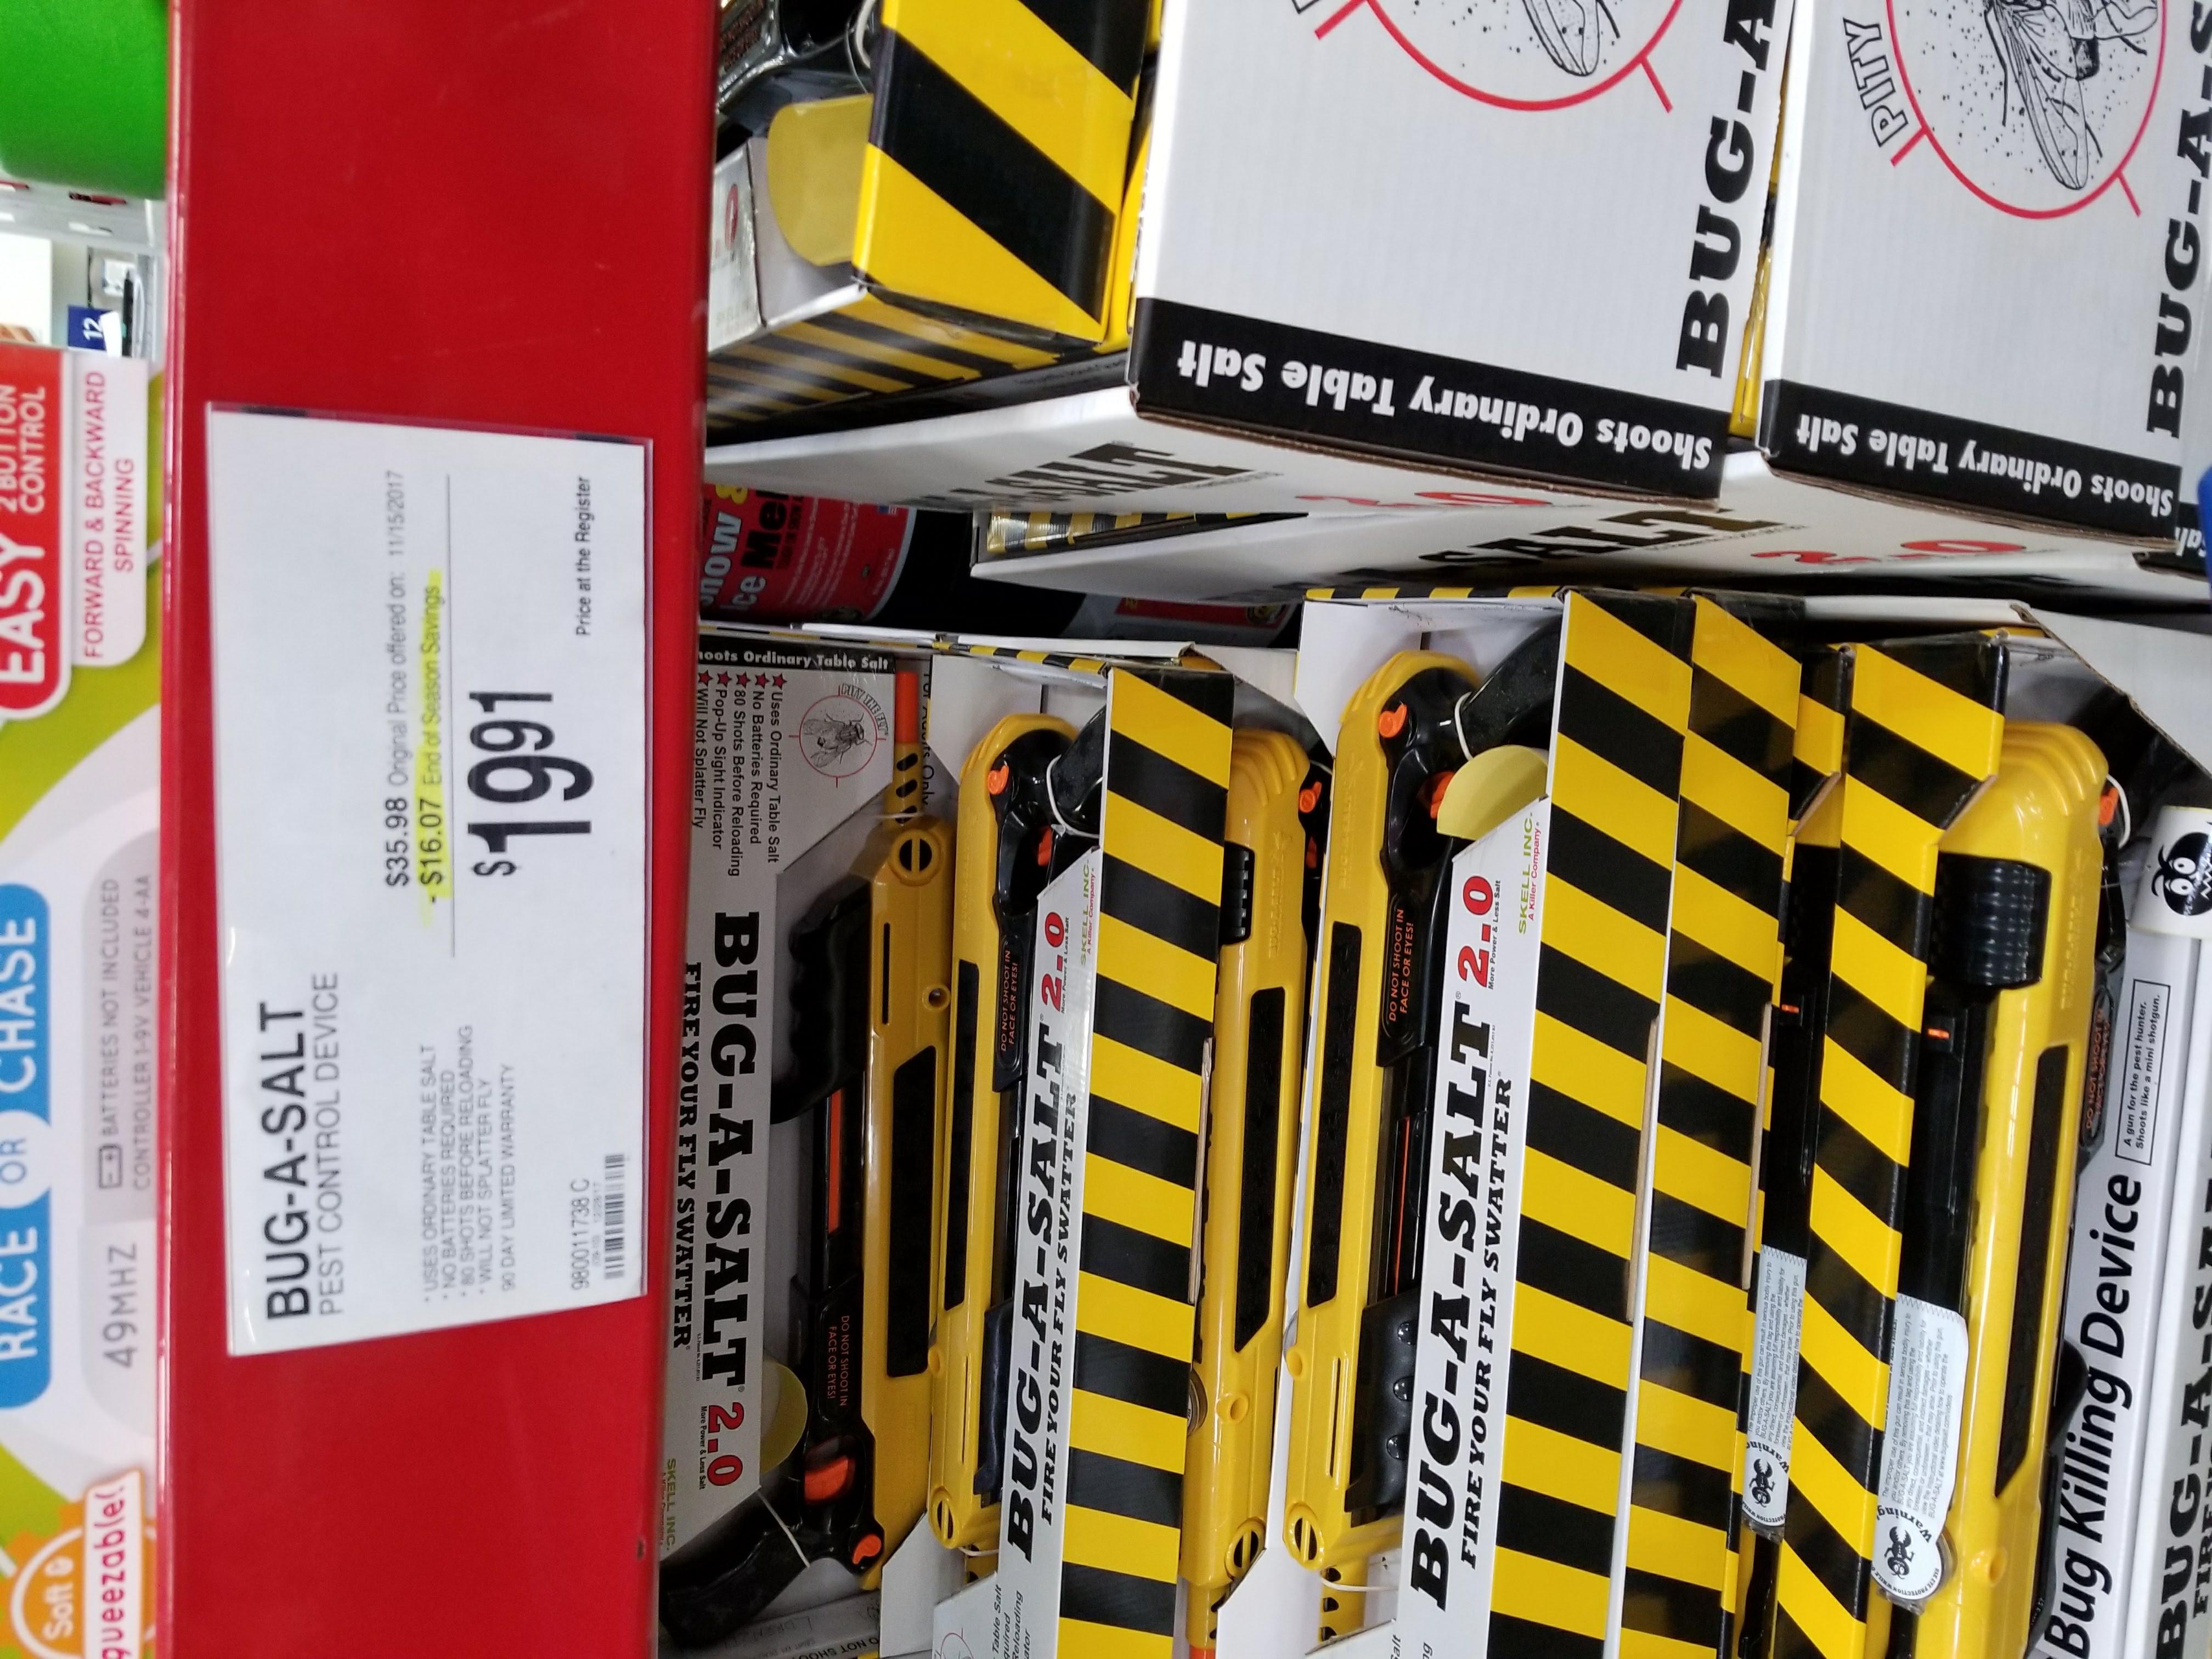 Sam's Club: Bug-A-Salt 2.0 Pest Control Device - Yellow $19.91